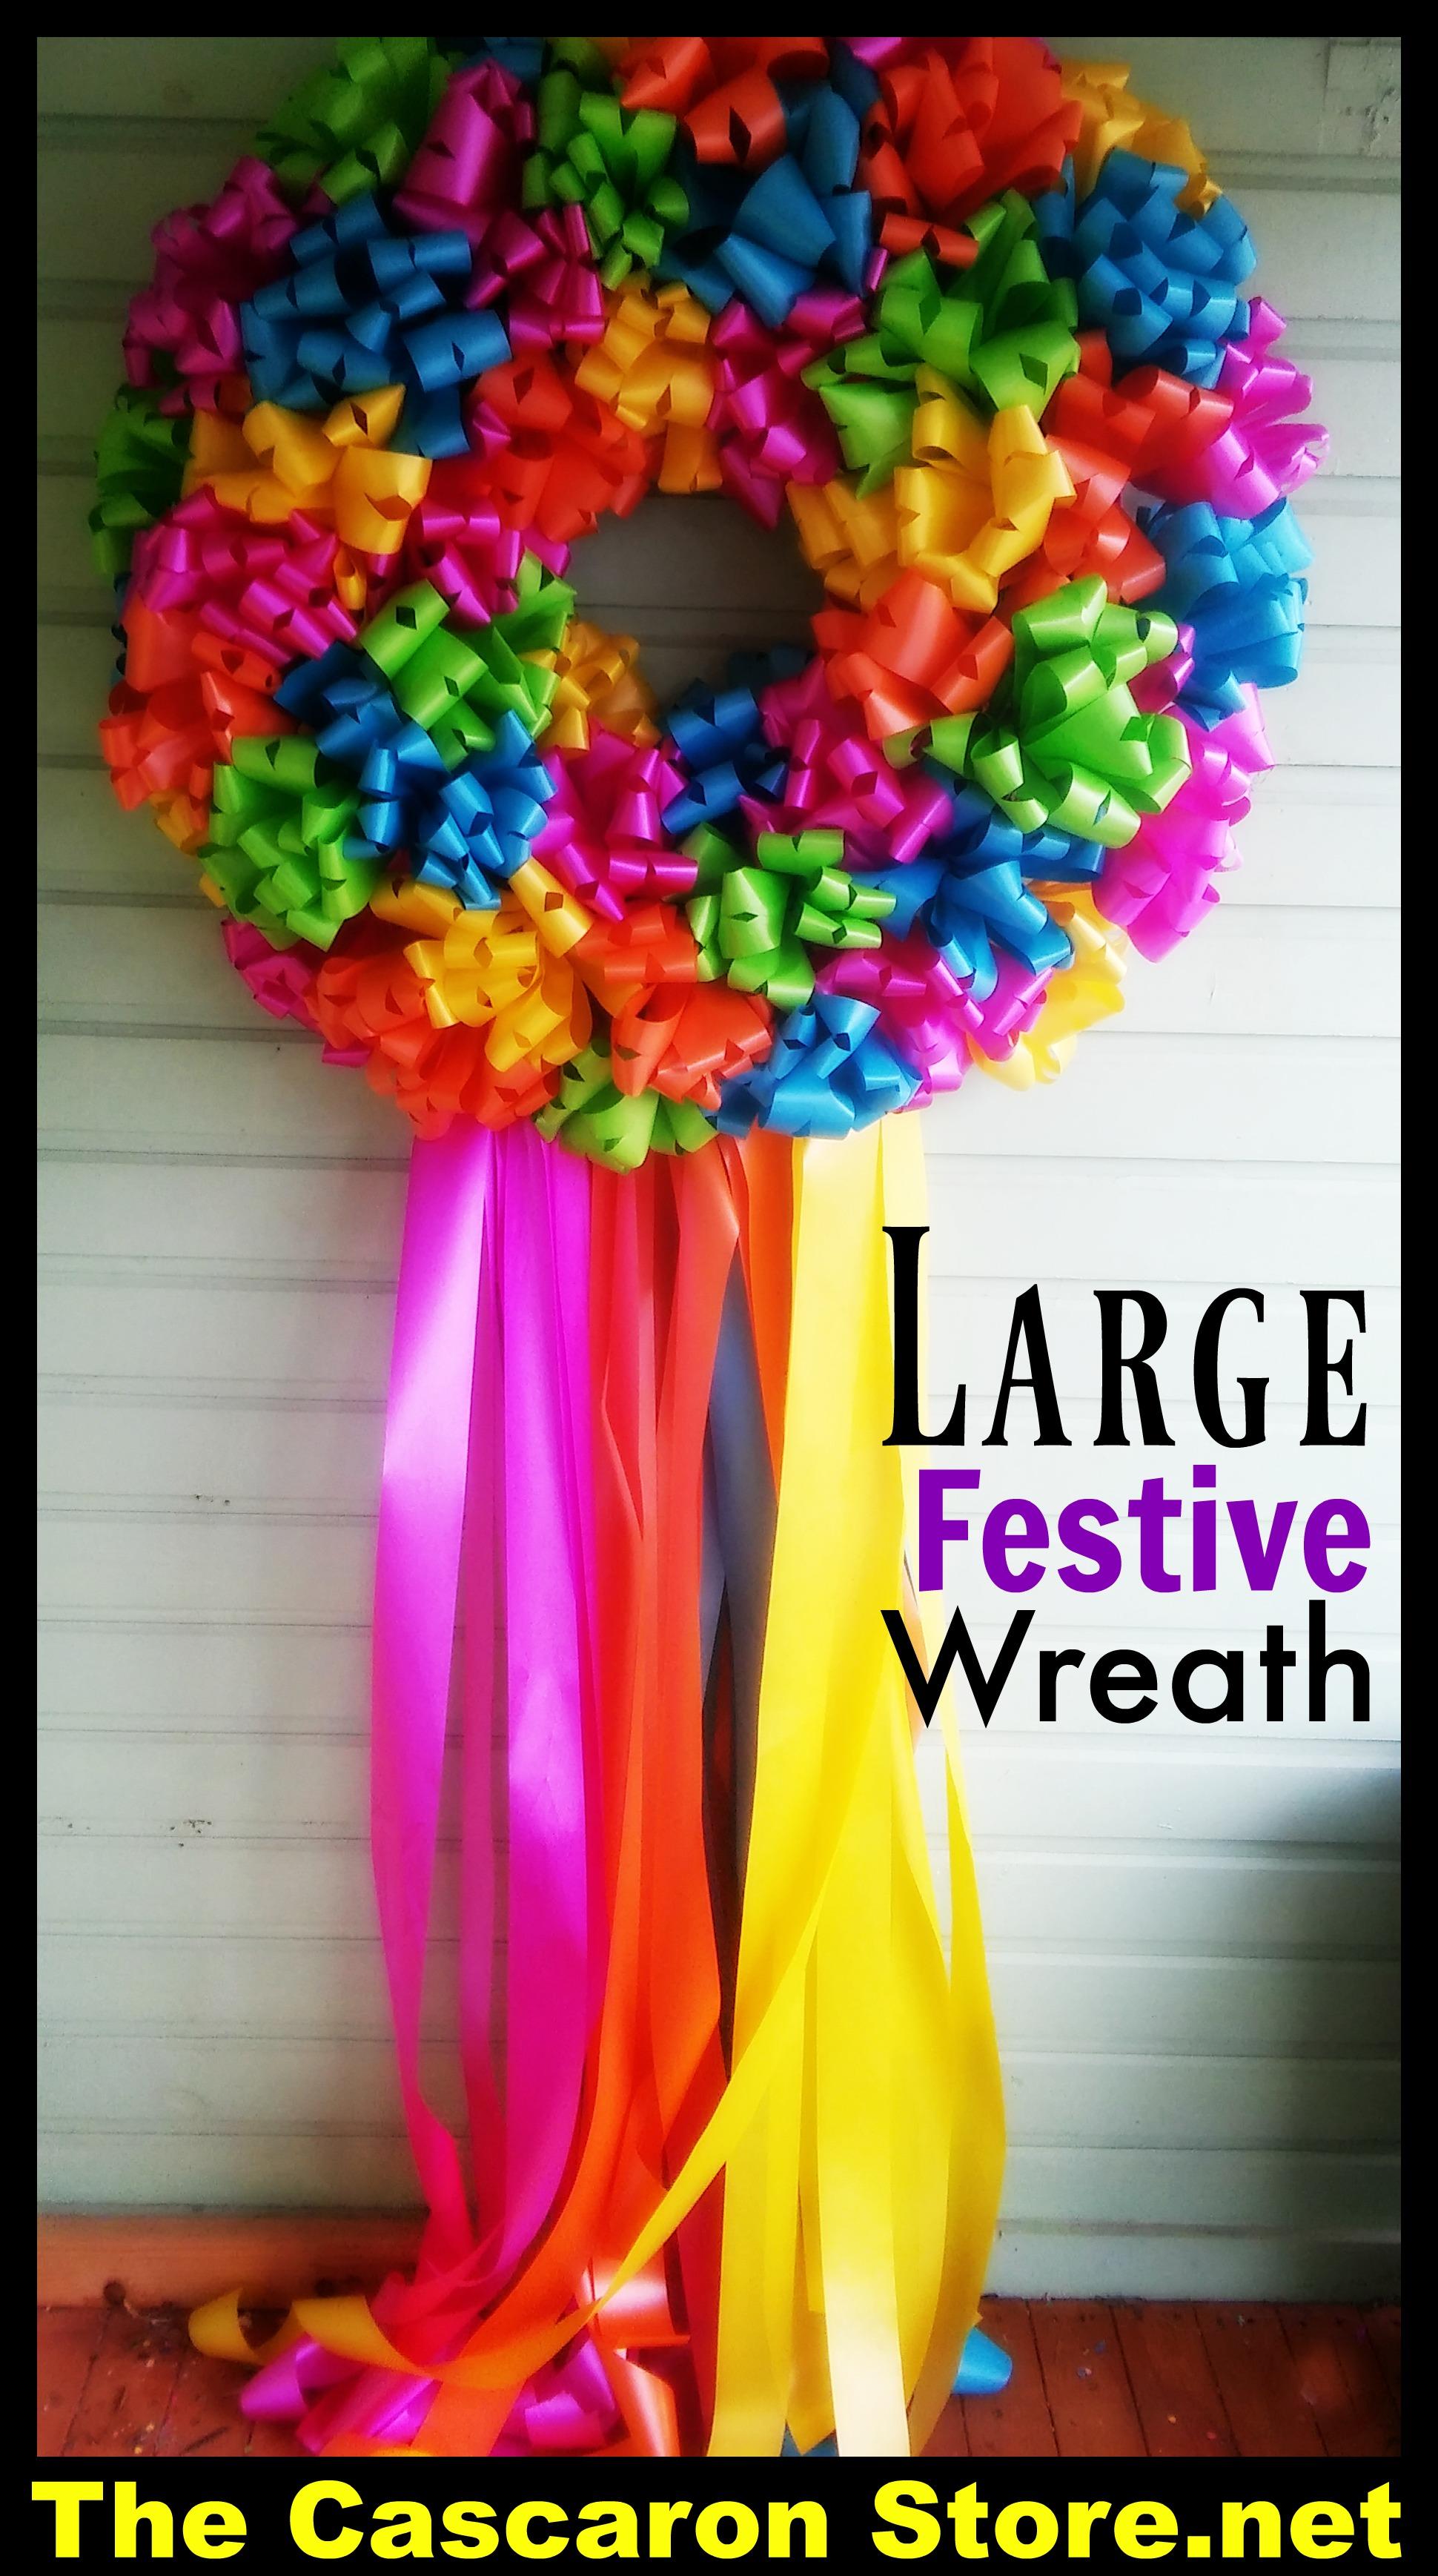 wreath large festive tcs